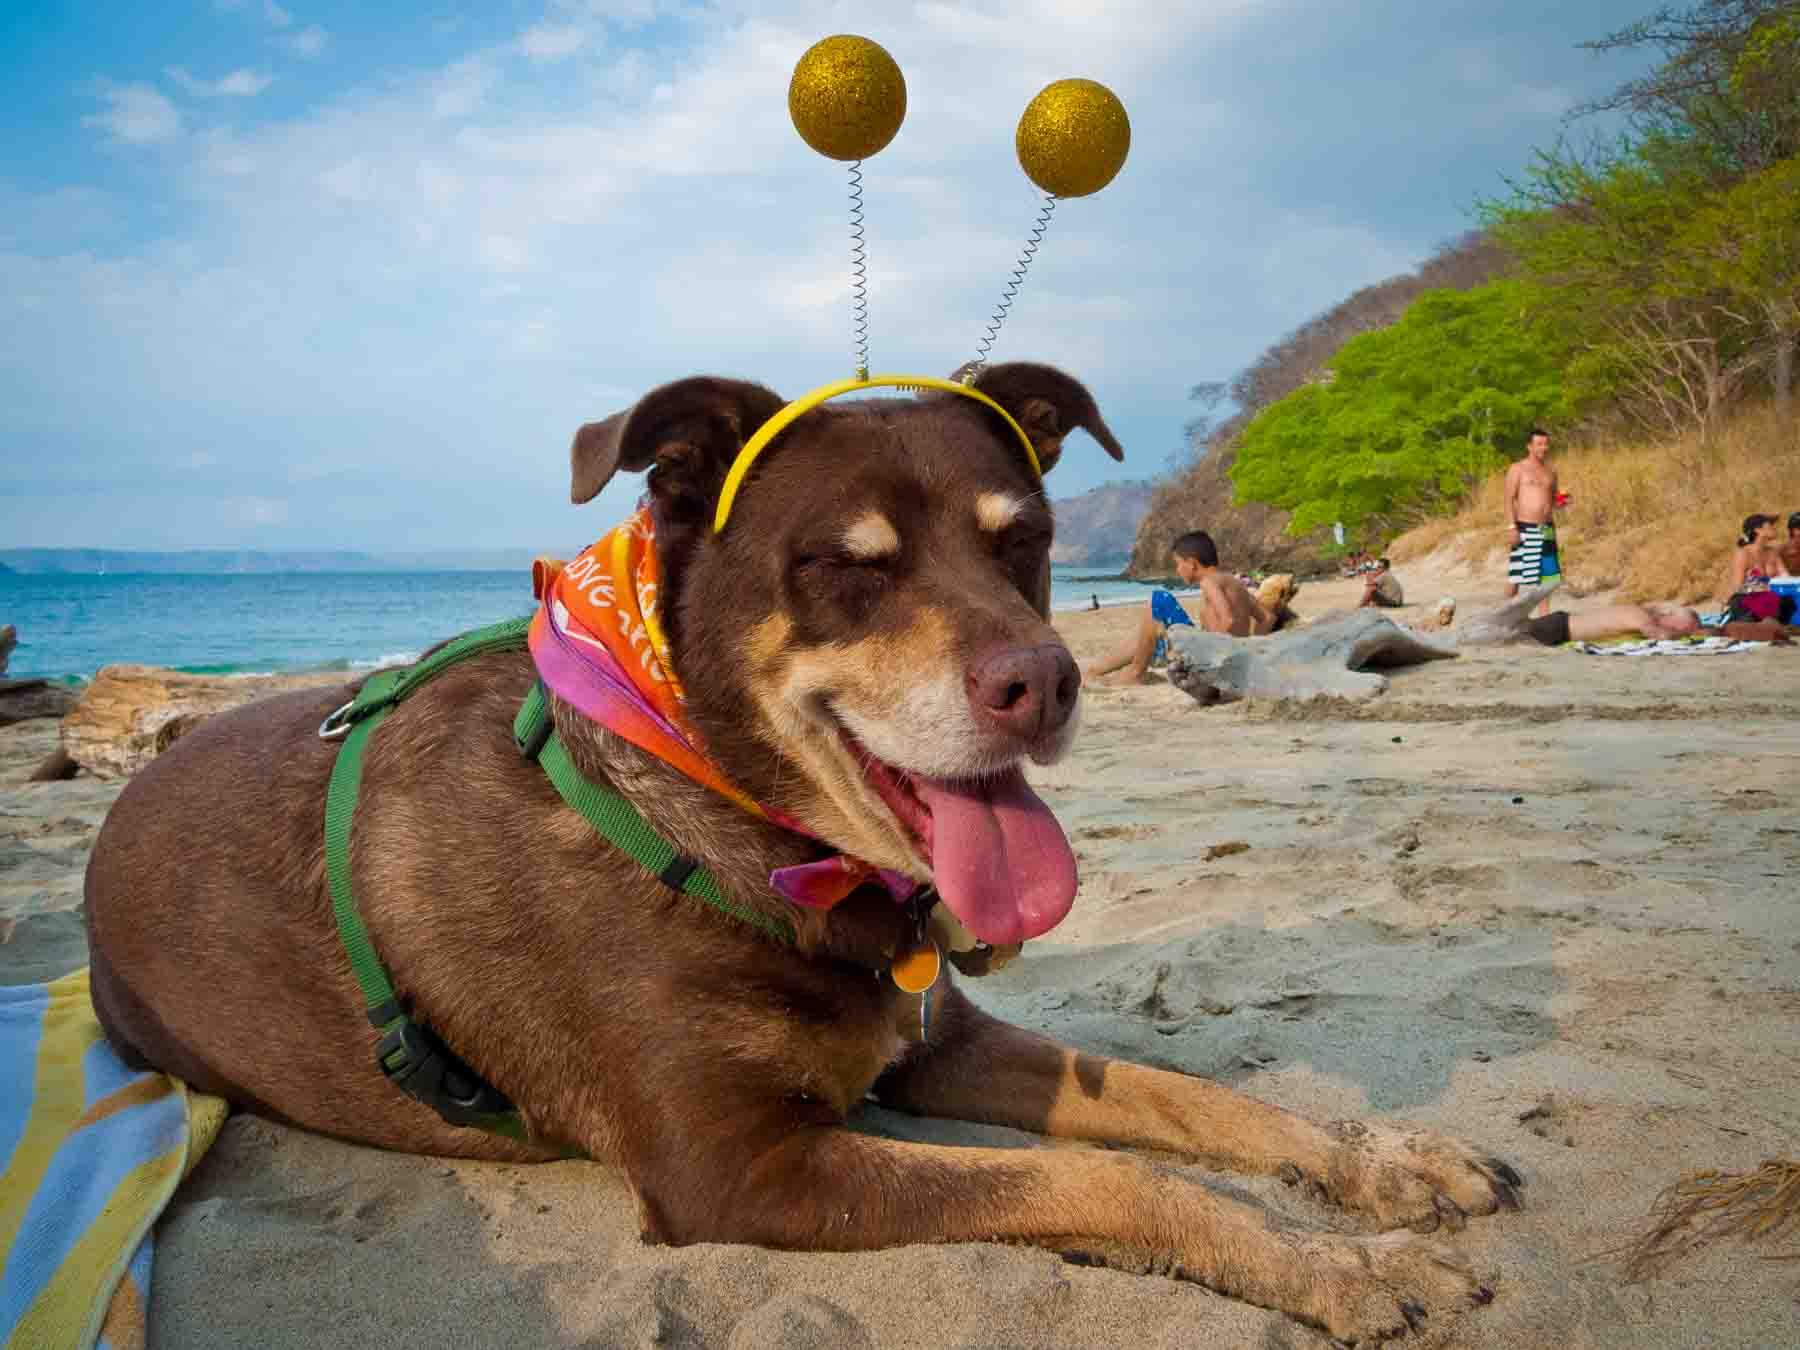 mocha on the beach with alien antennae